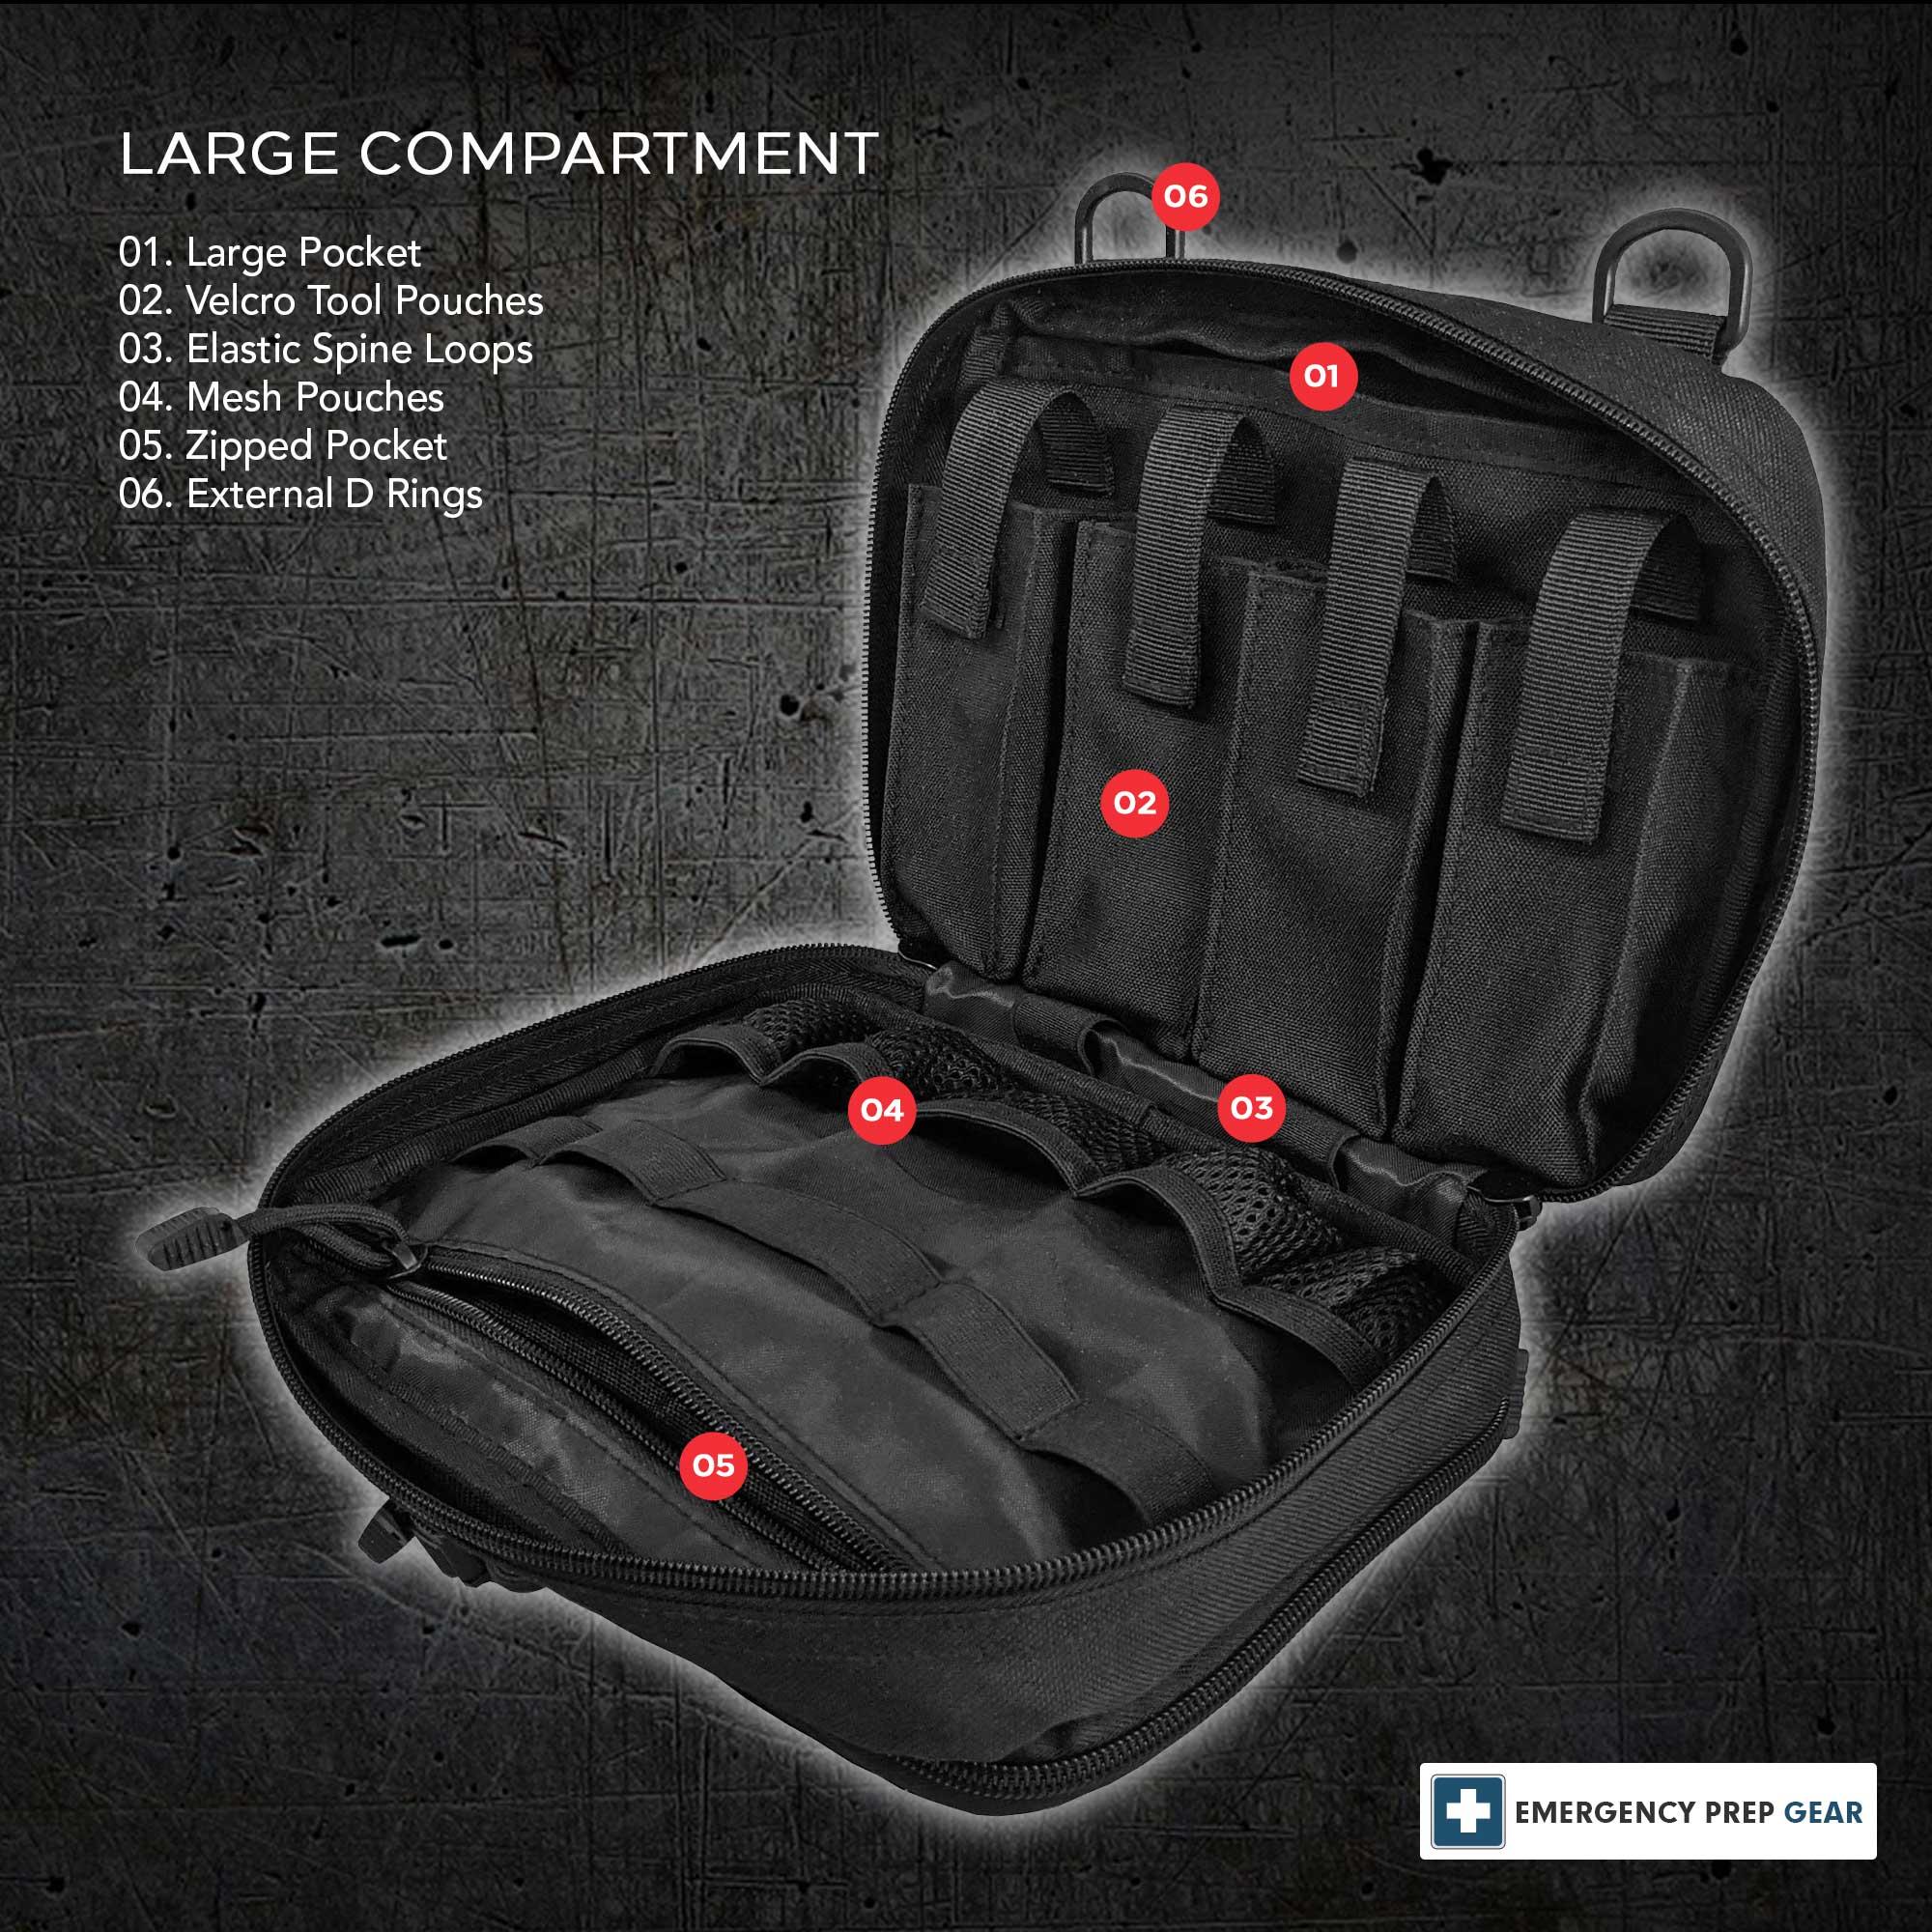 21 10 08 16 21 43 original b09dqz9vnl epg gear black compartment1